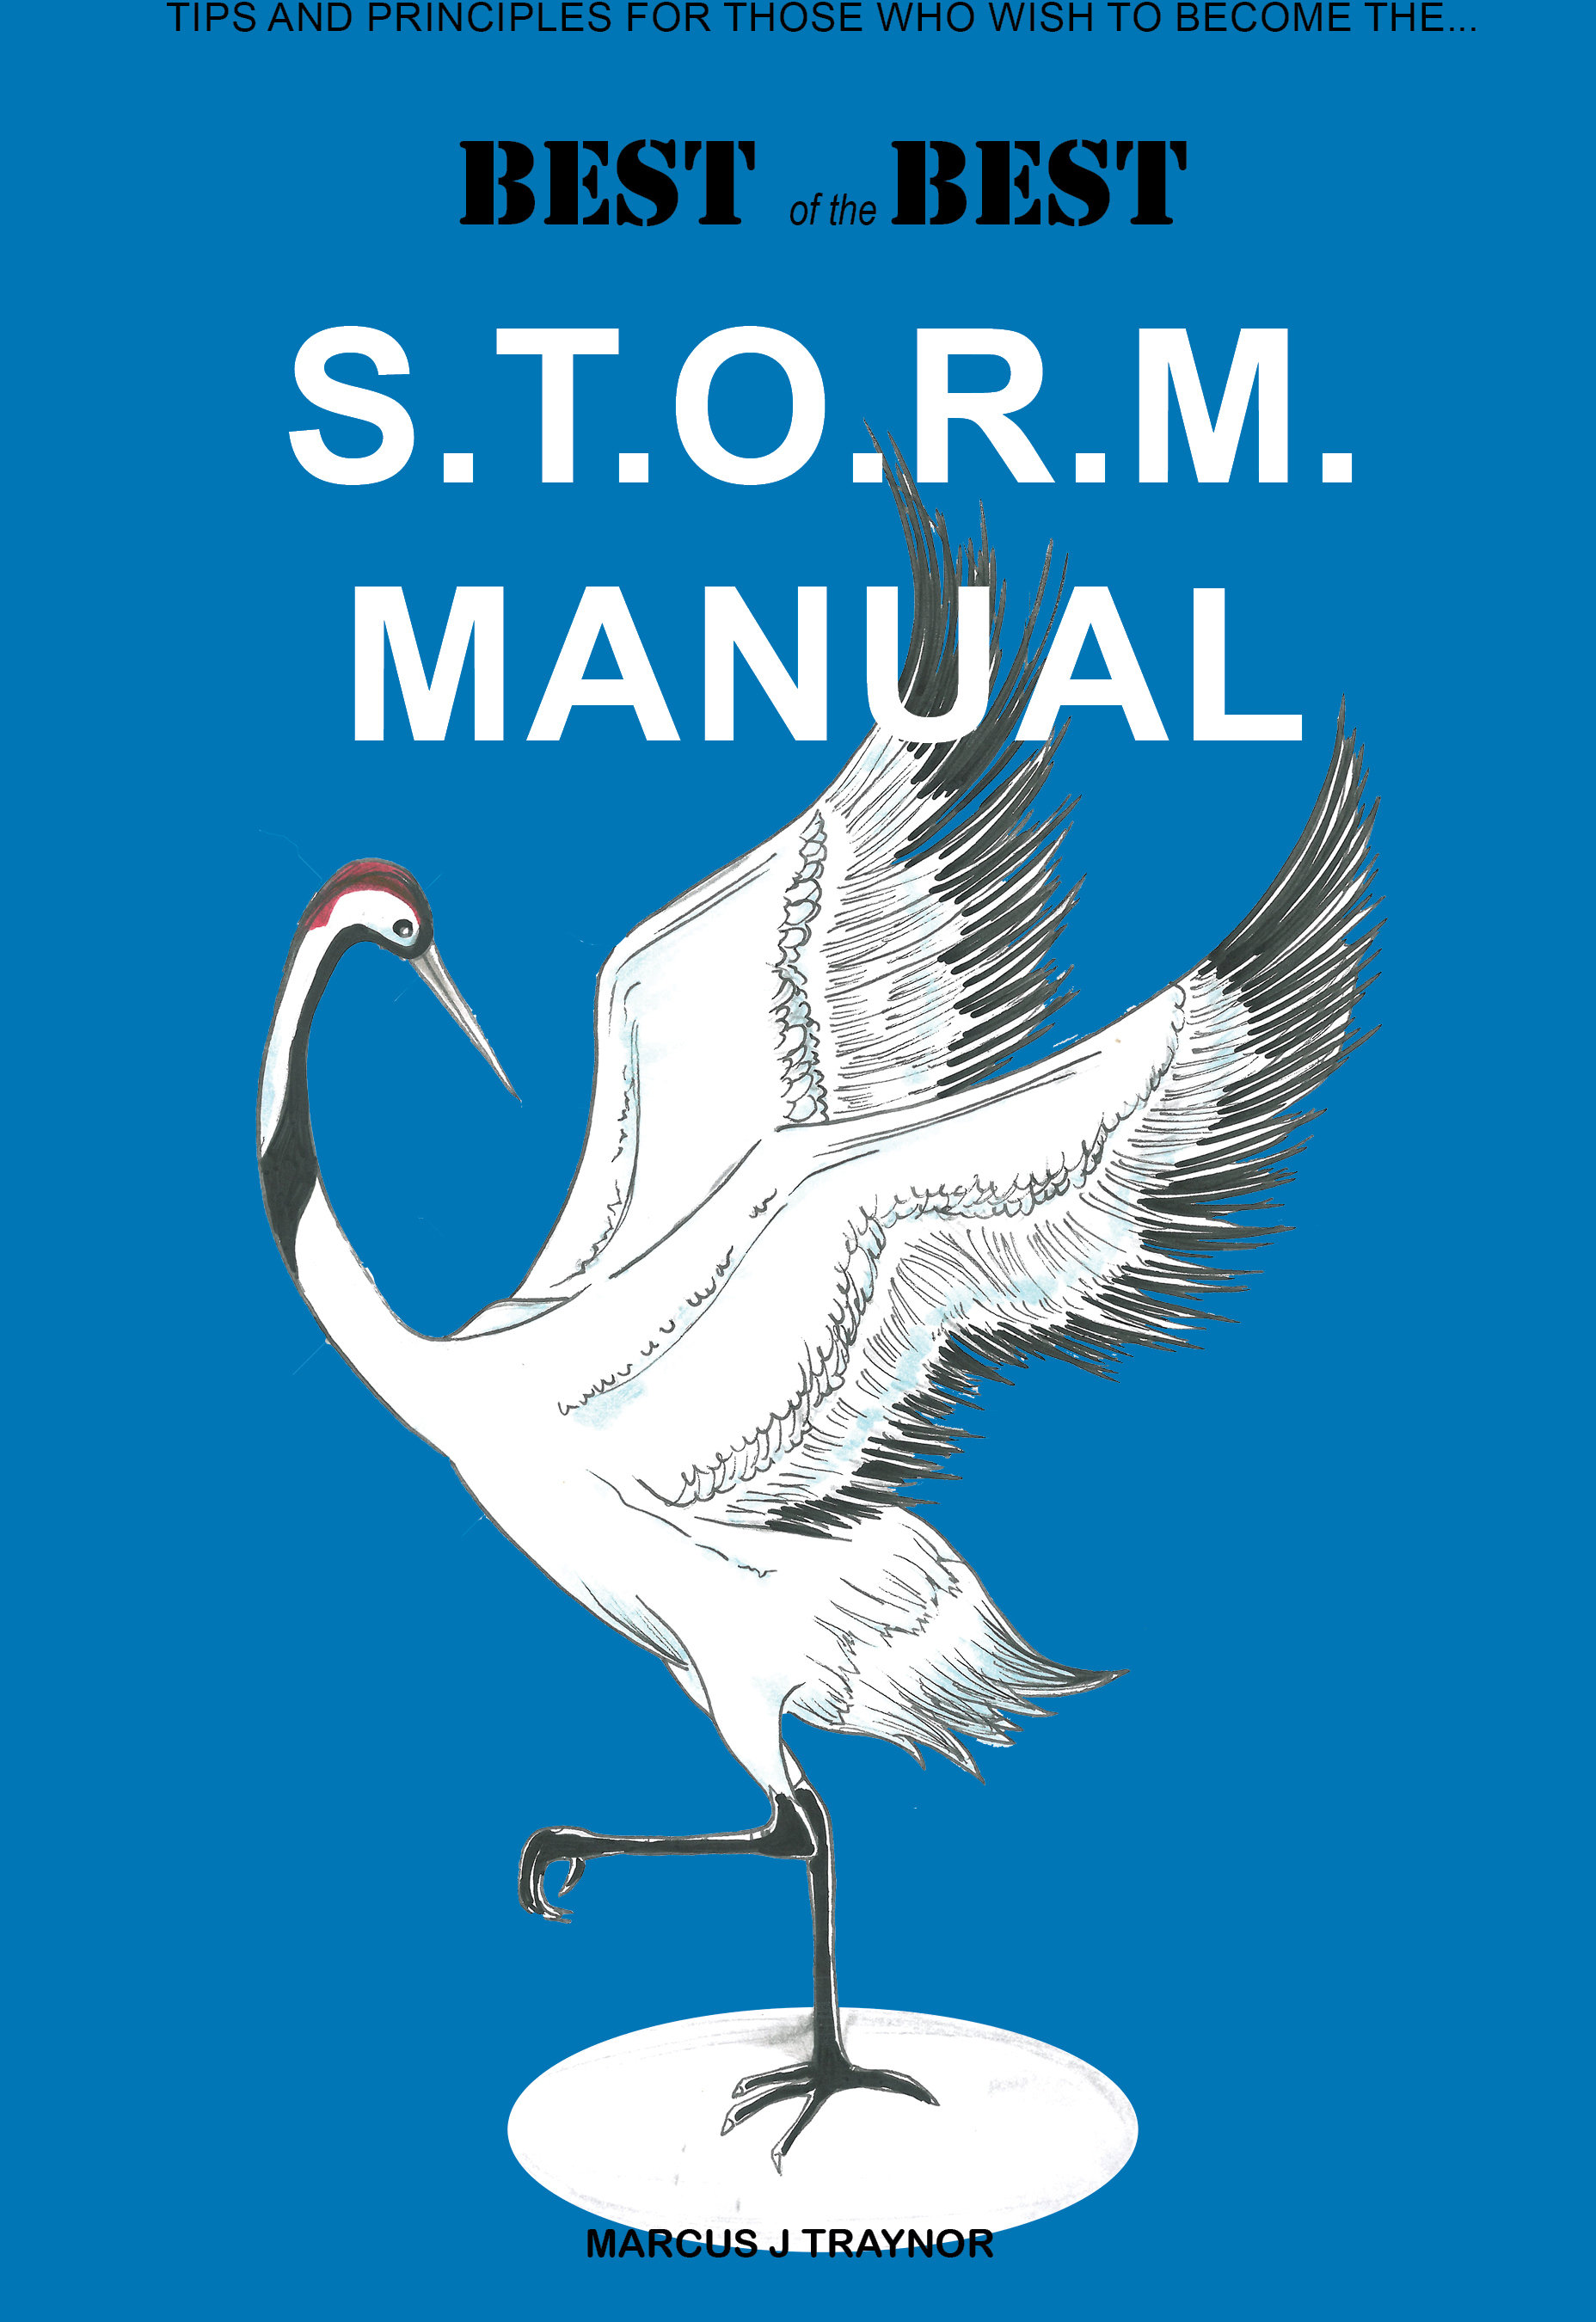 S.T.O.R.M. Manual 00038